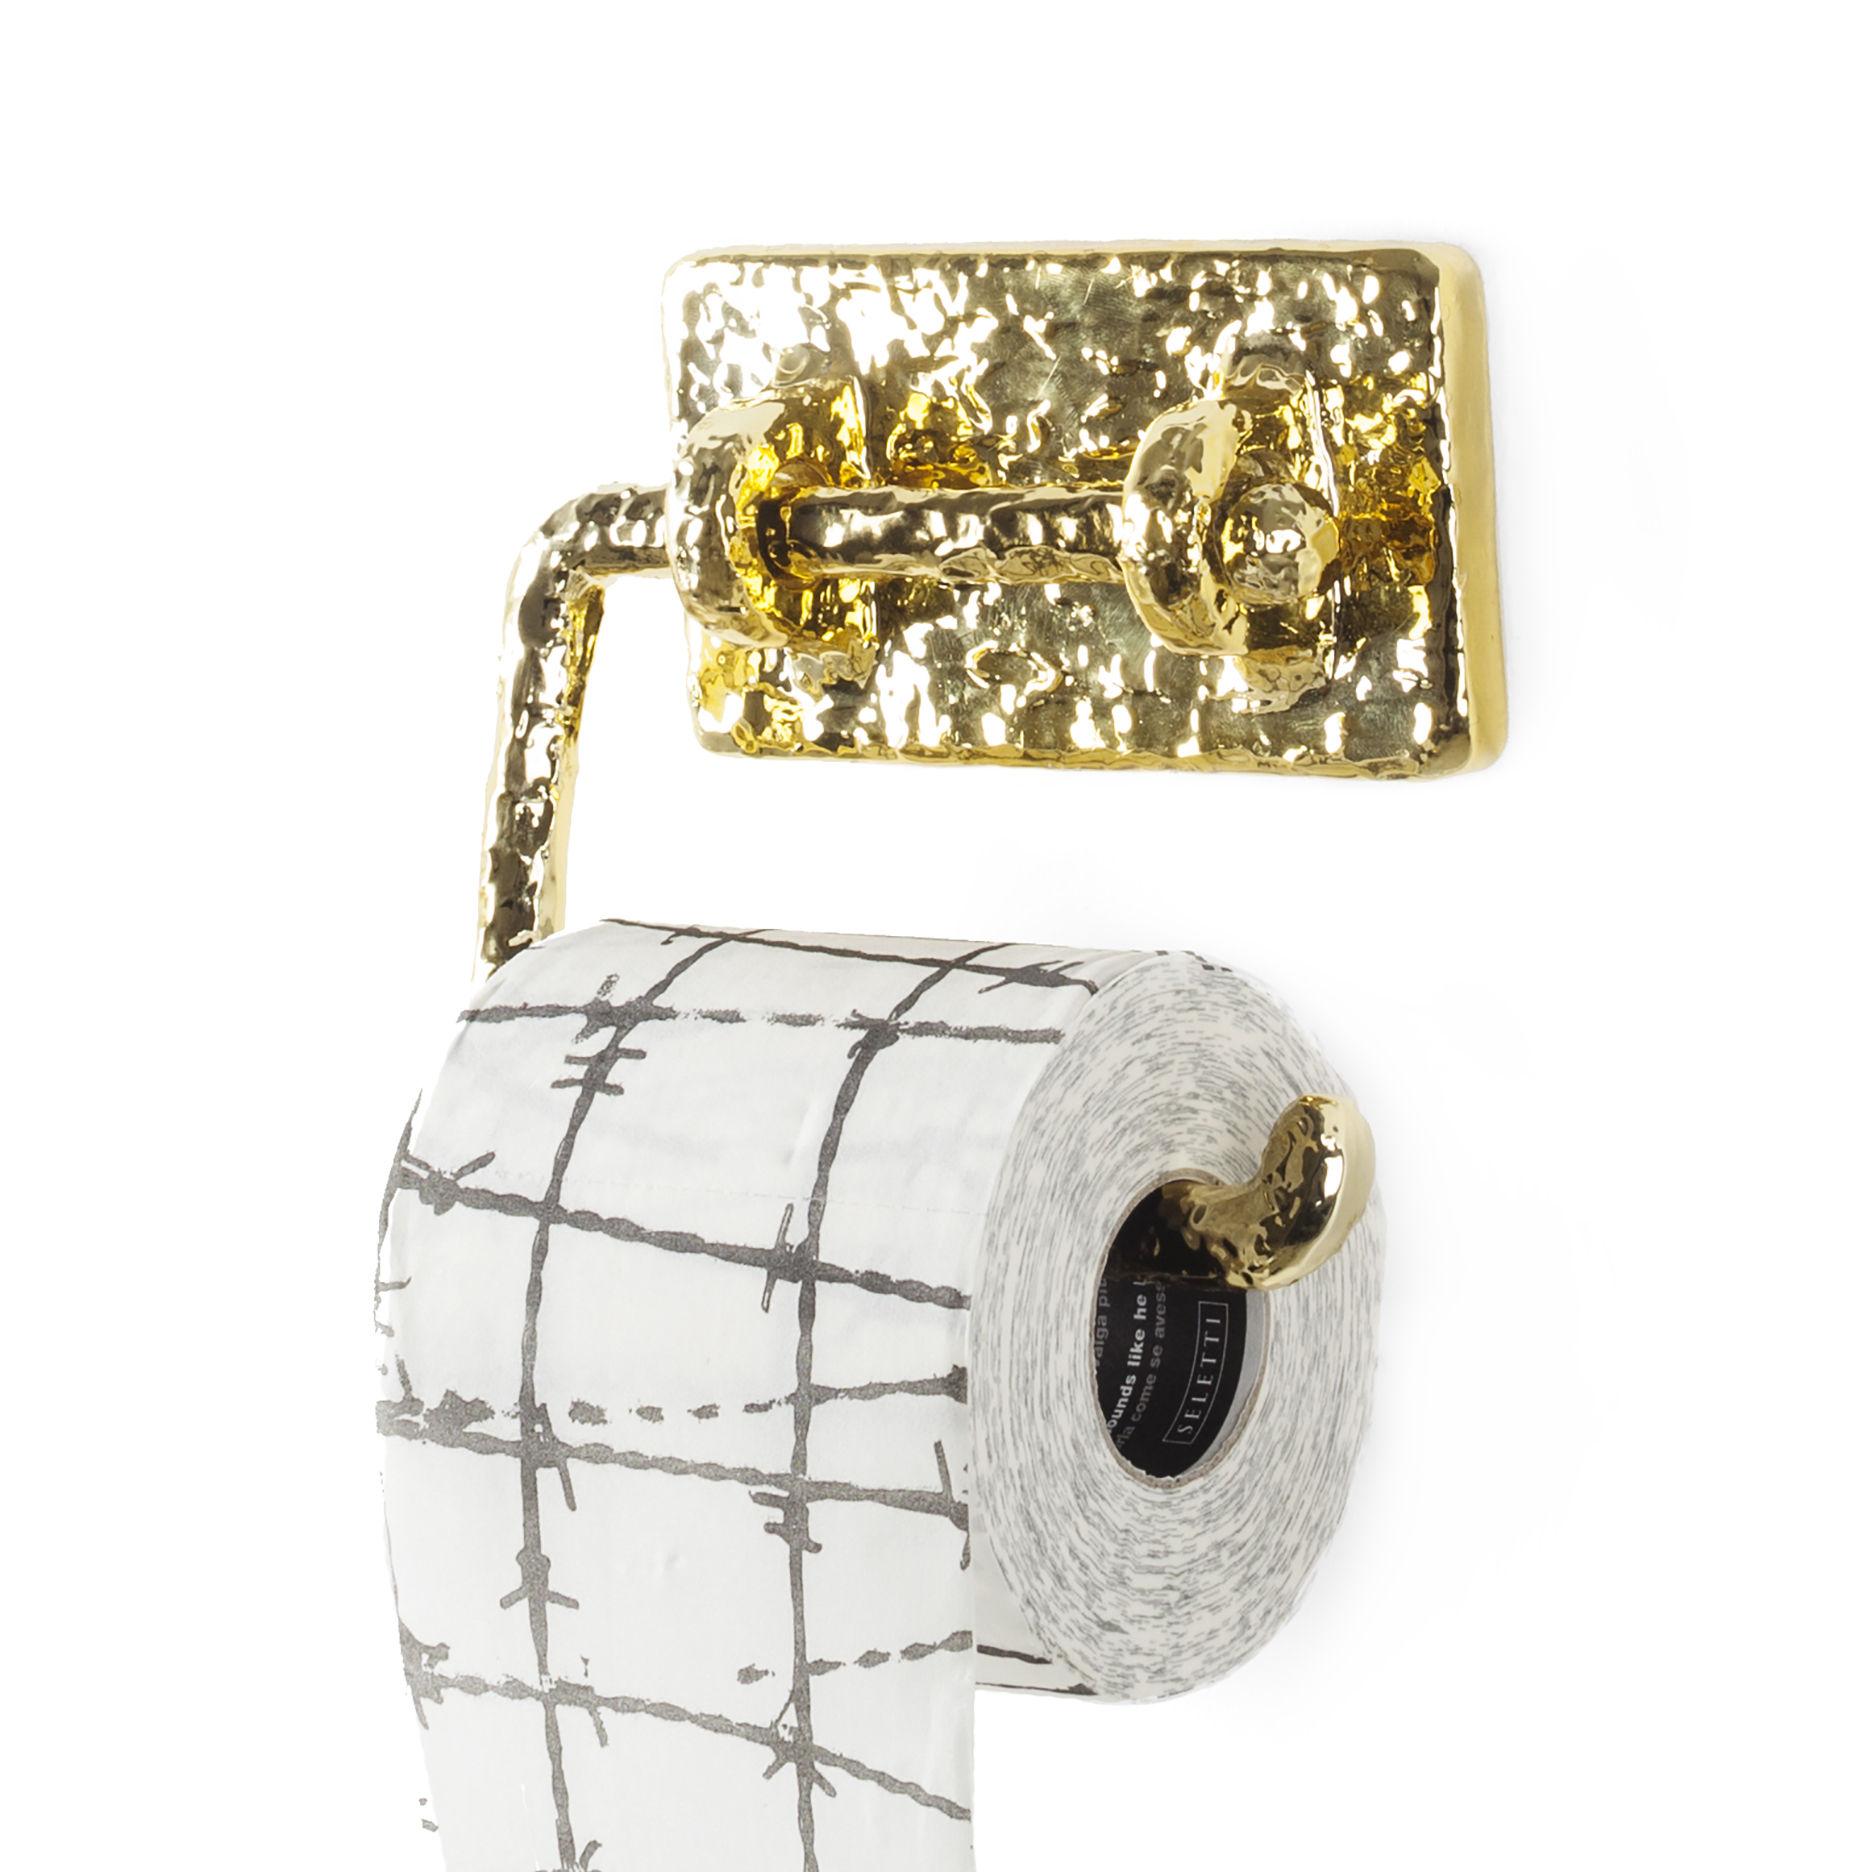 Accessoires - Accessoires für das Bad - Mauriziø Toilettenpapierhalter / goldfarben - Seletti - Messing - Harz, Messing